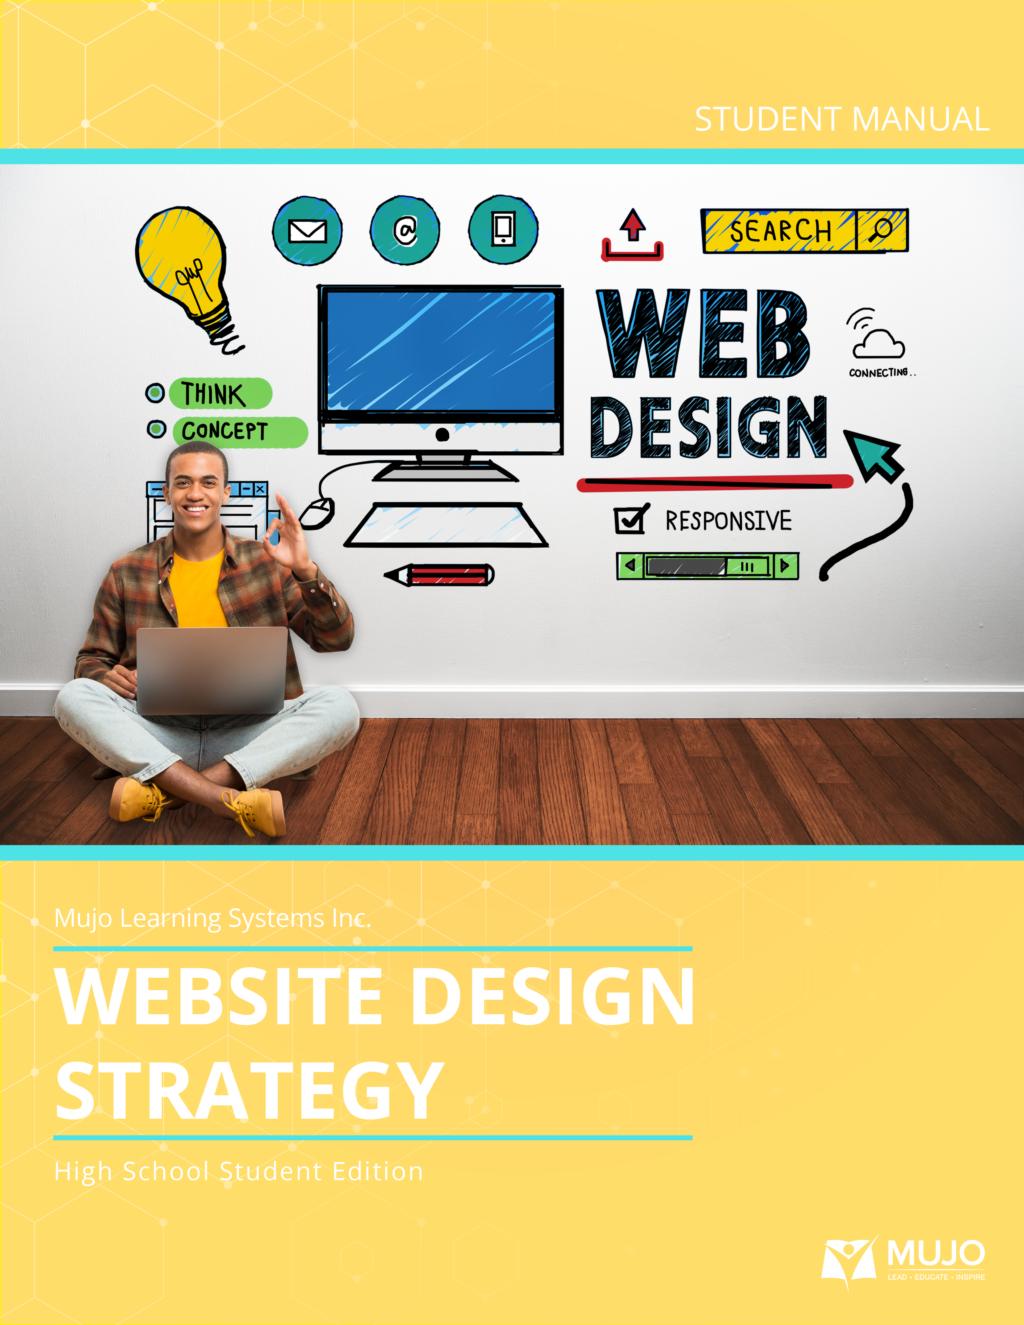 Web design strategy textbook